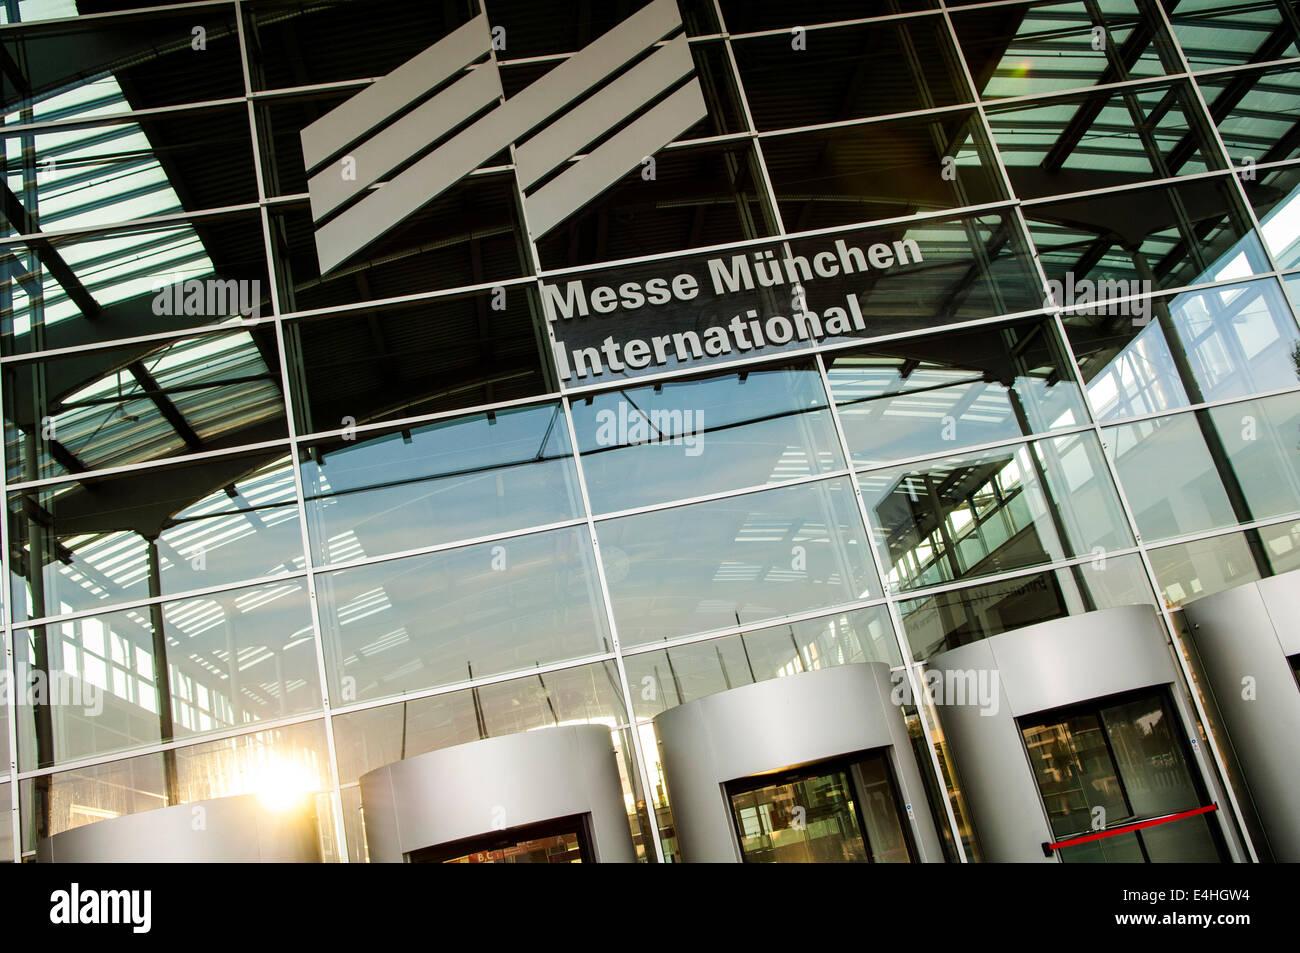 Entrance of Messe München International, Riem, Munich, Germany - Stock Image